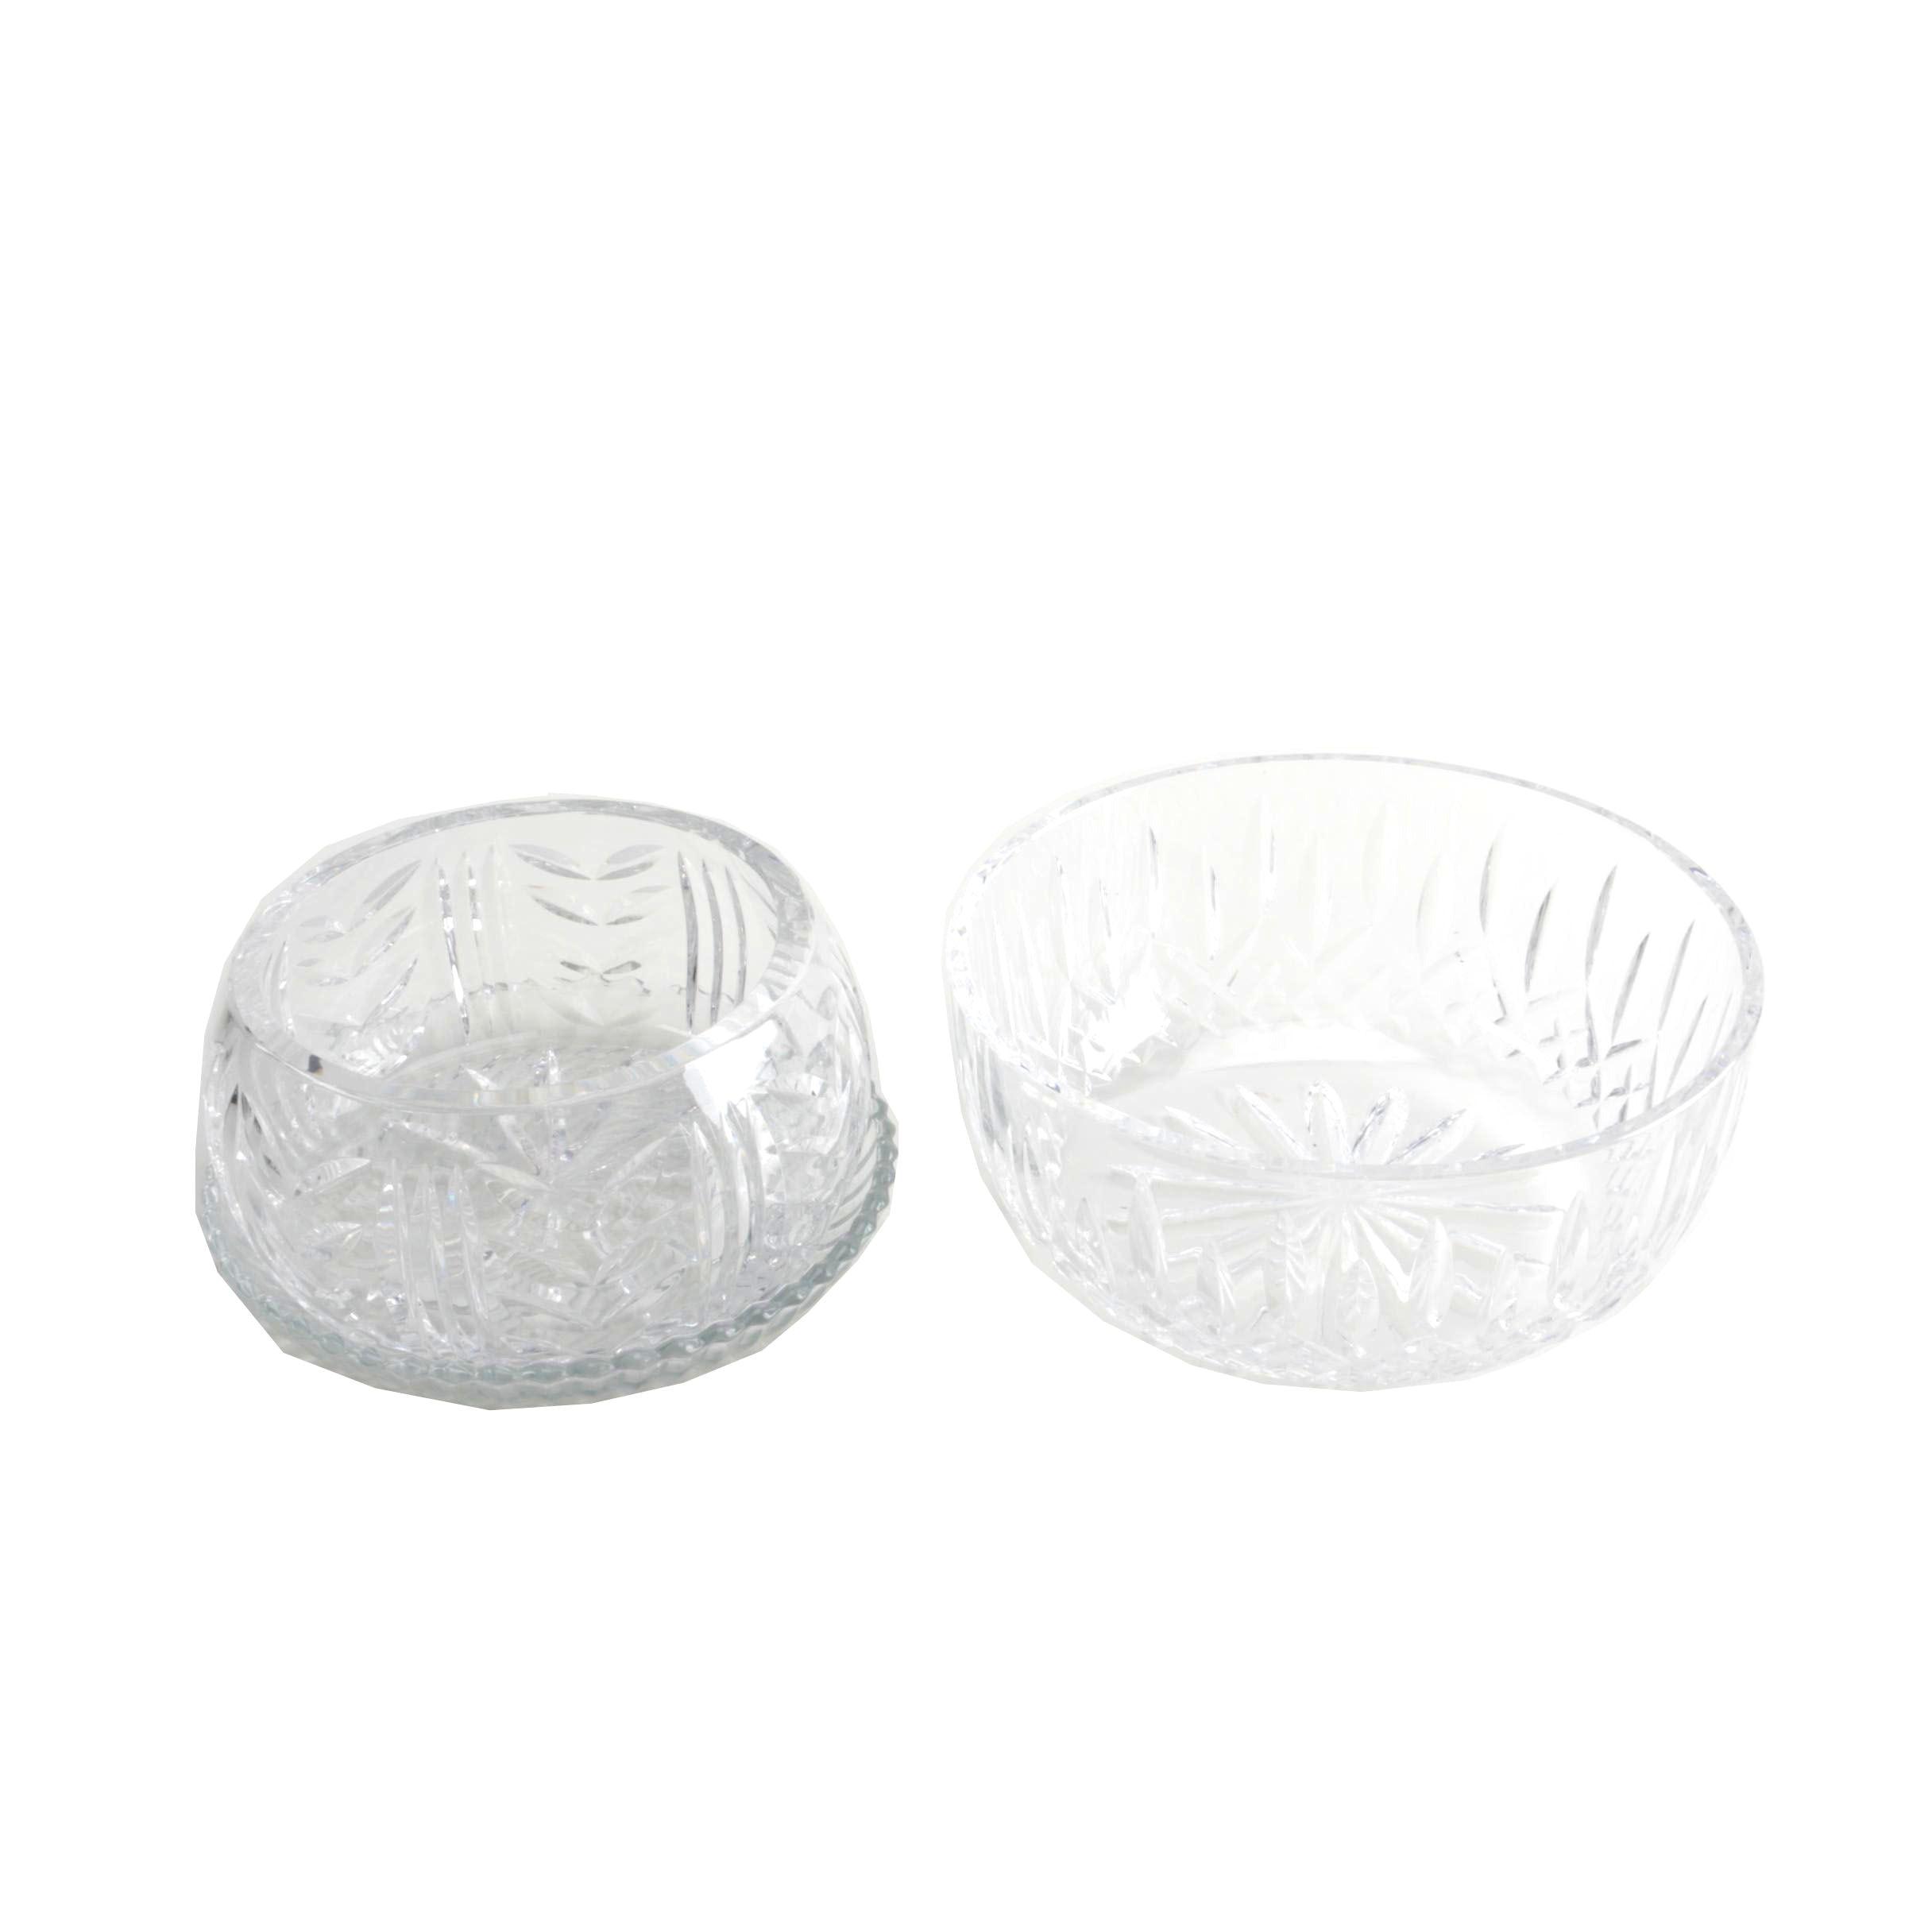 "Waterford Crystal ""Glencar"" and ""Lismore"" Crystal Bowls"